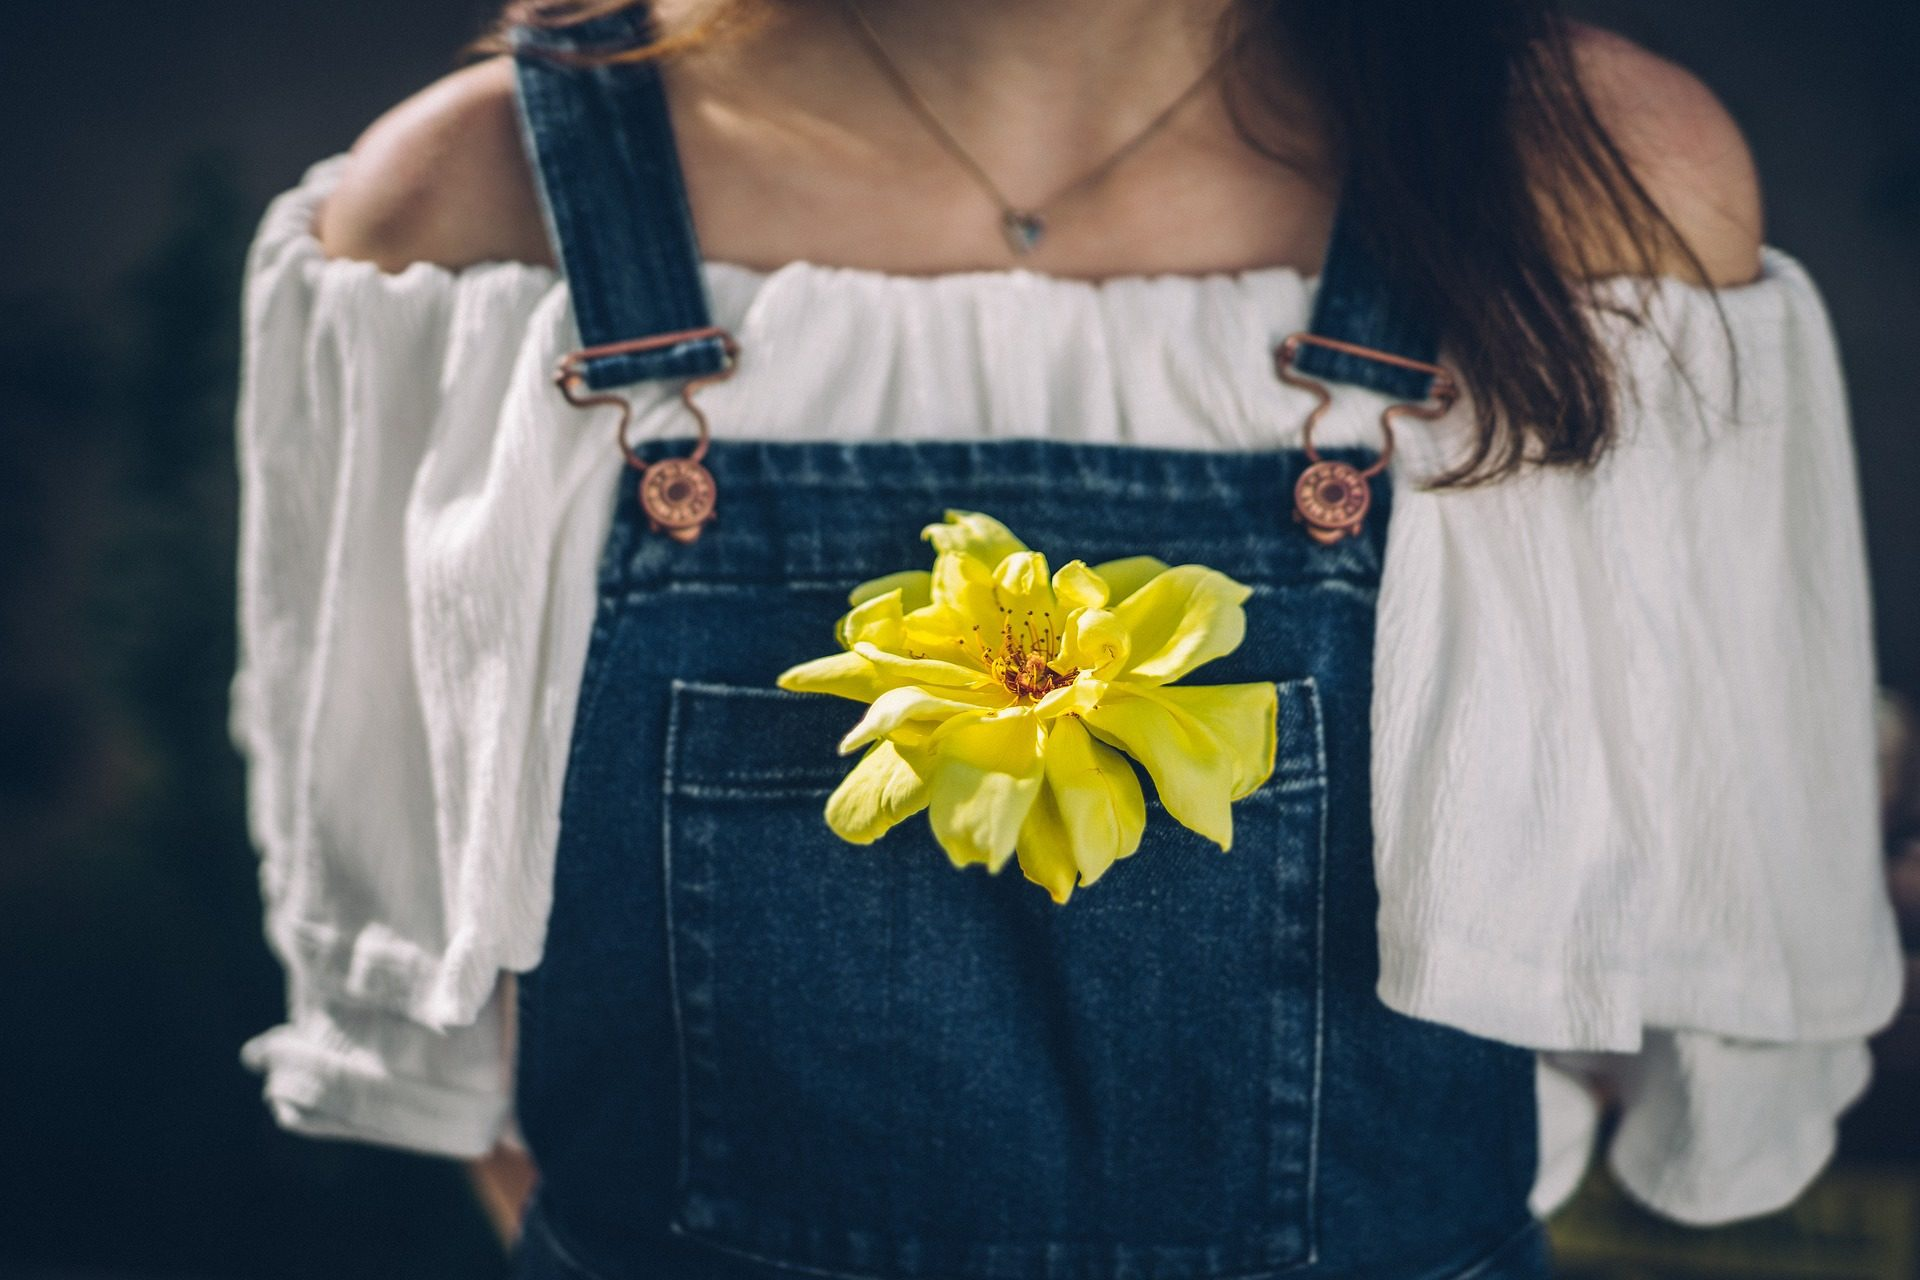 flor, peto, tirantes, mujer, pelo - Fondos de Pantalla HD - professor-falken.com